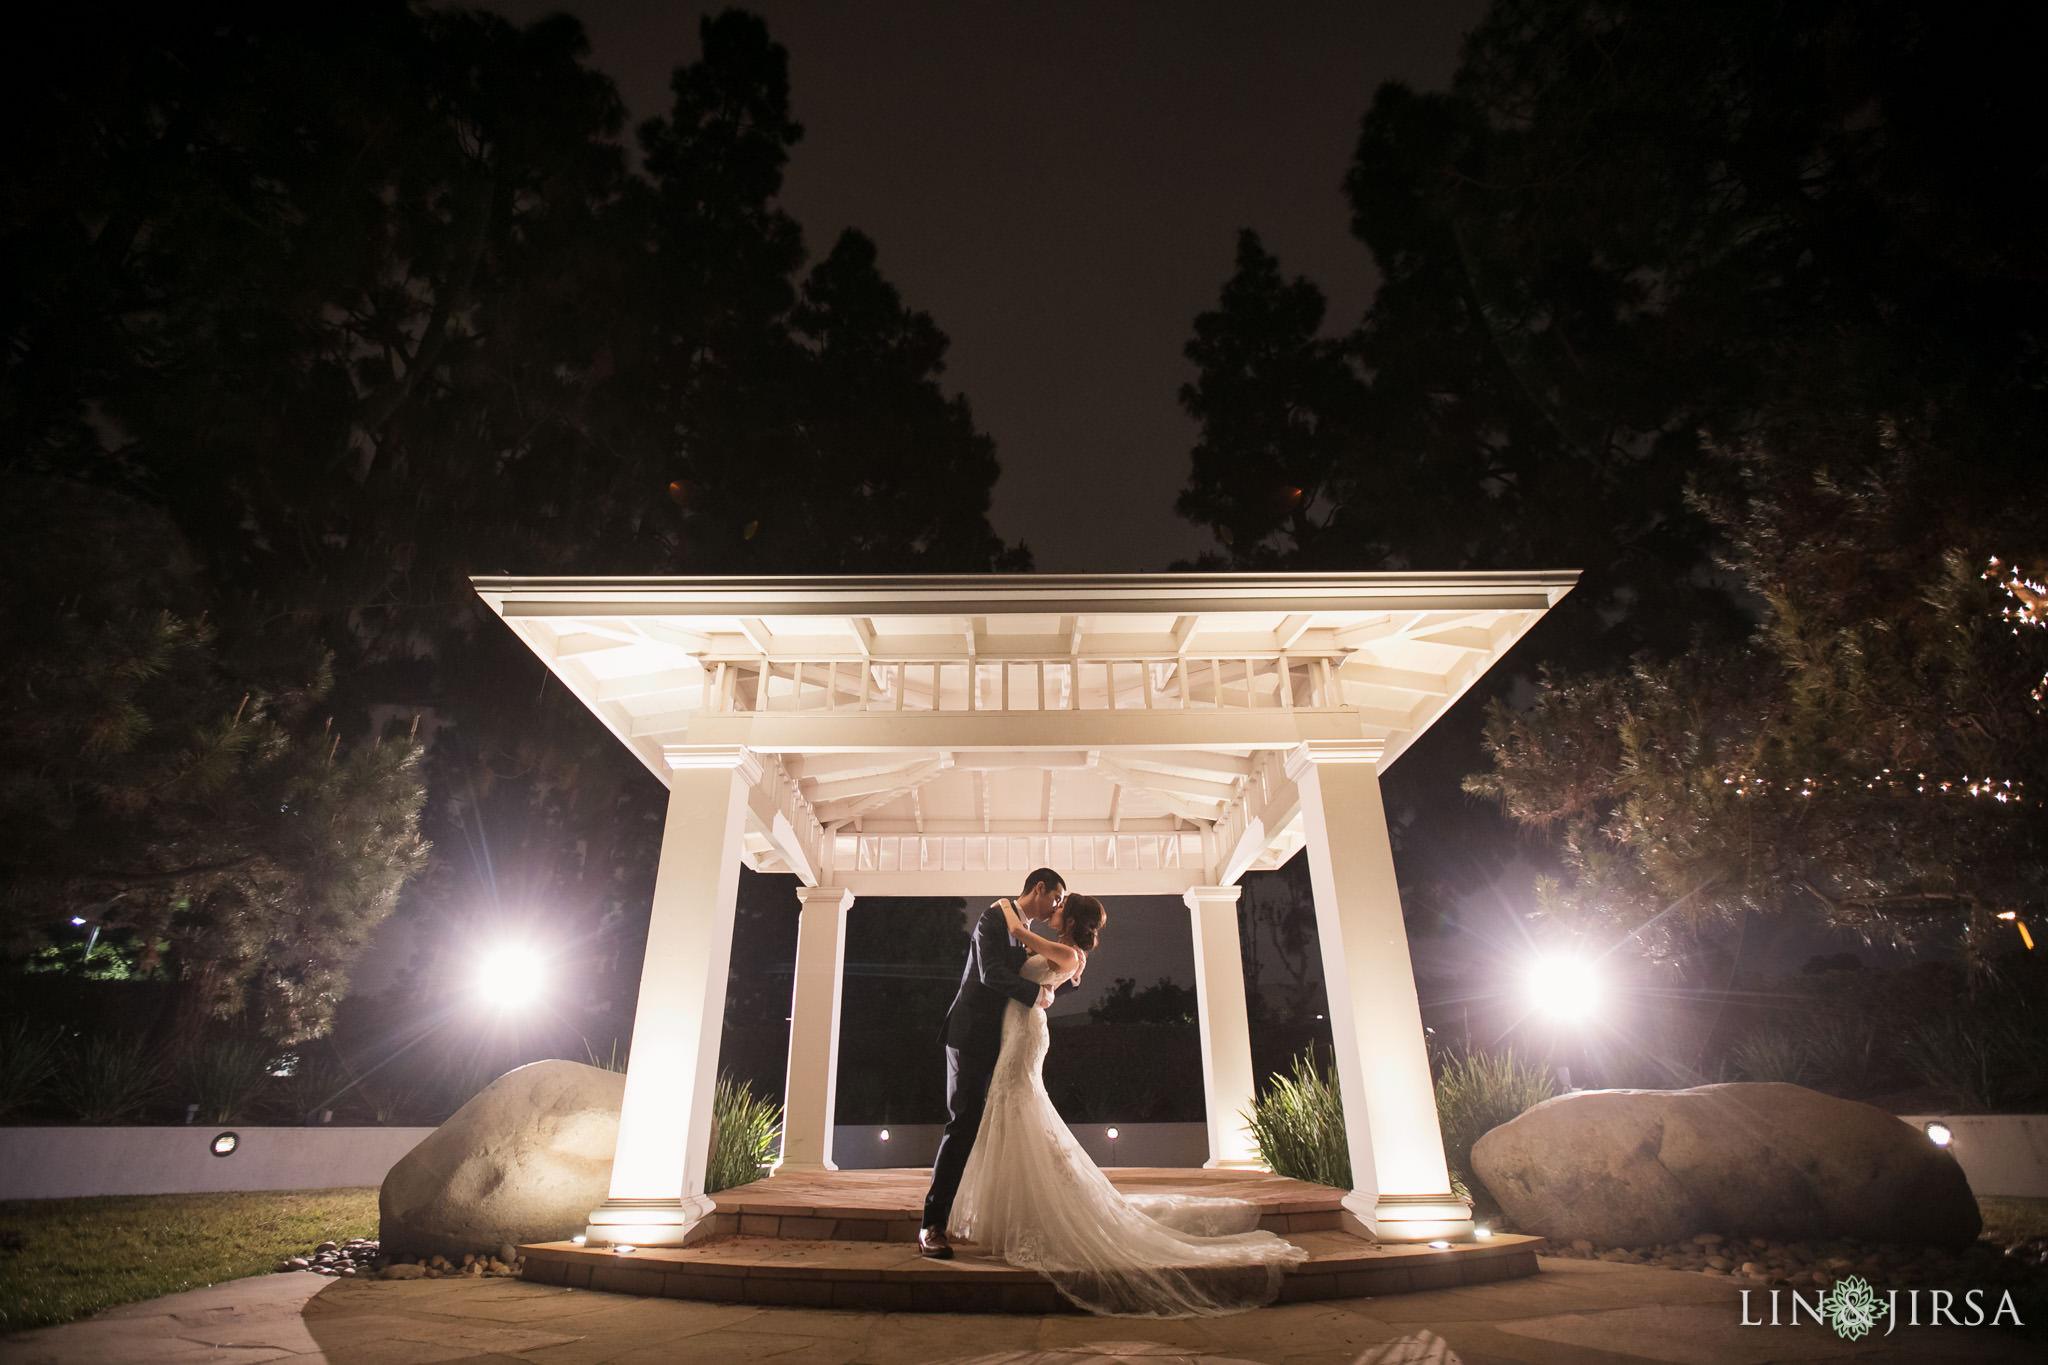 turnip rose wedding lin and jirsa photography